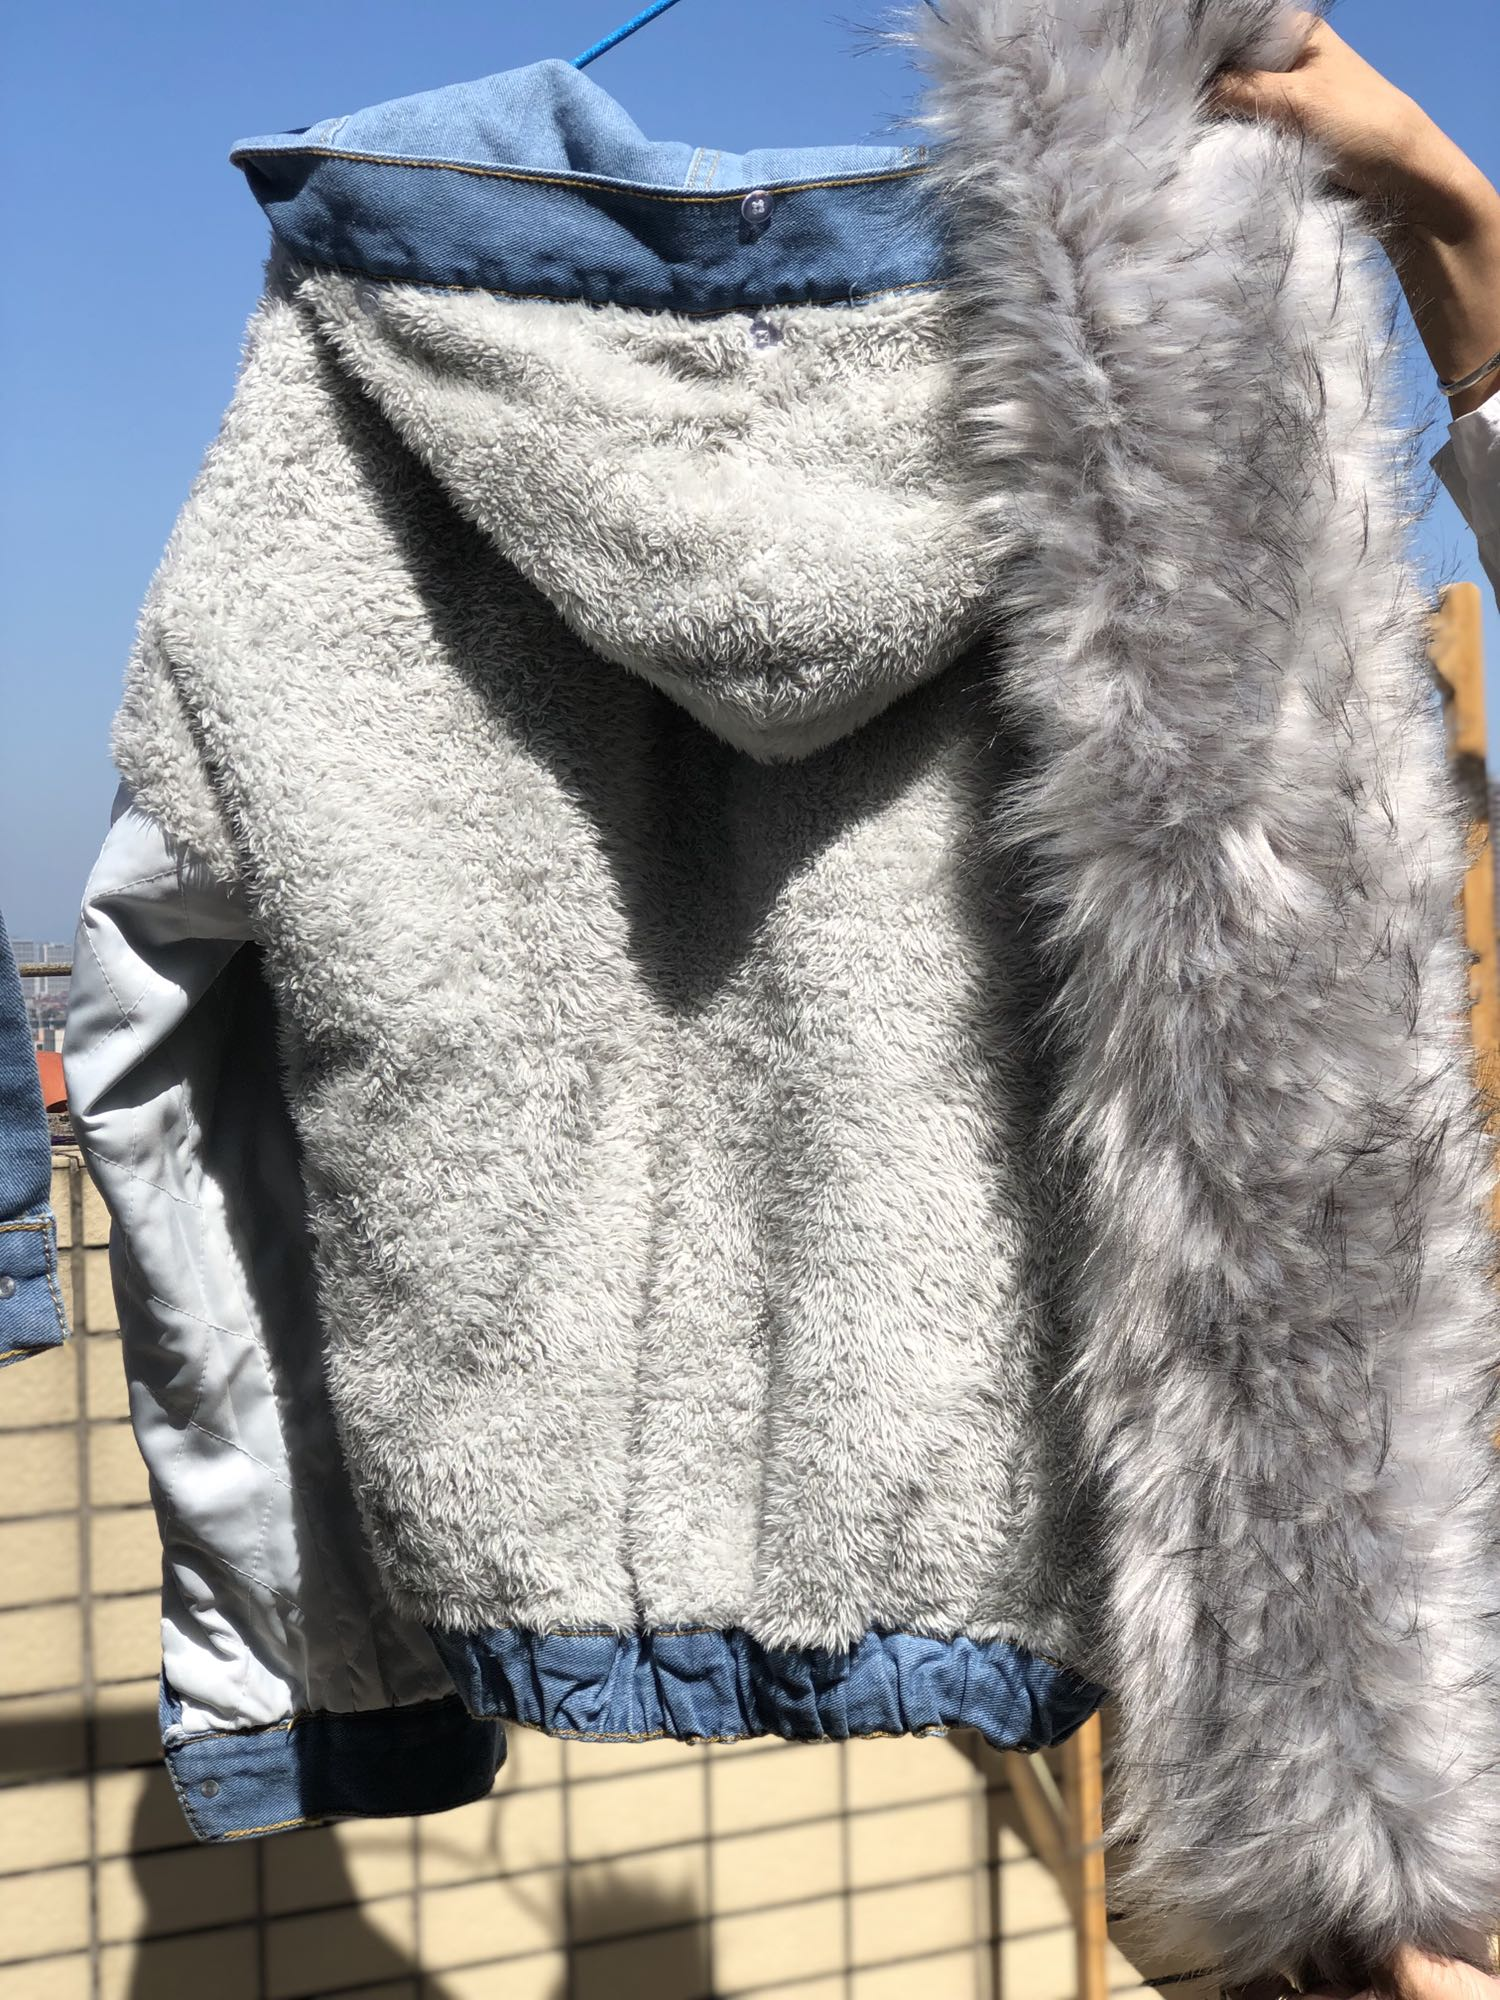 H8a2bfca4c19540bd938321269d3cea524 LUZUZI 2019 New Warm Winter Bomber Women Winter Autumn Hooded Girls Coat Jeans Denim Jackets Basic Ladies Top Windbreaker Female